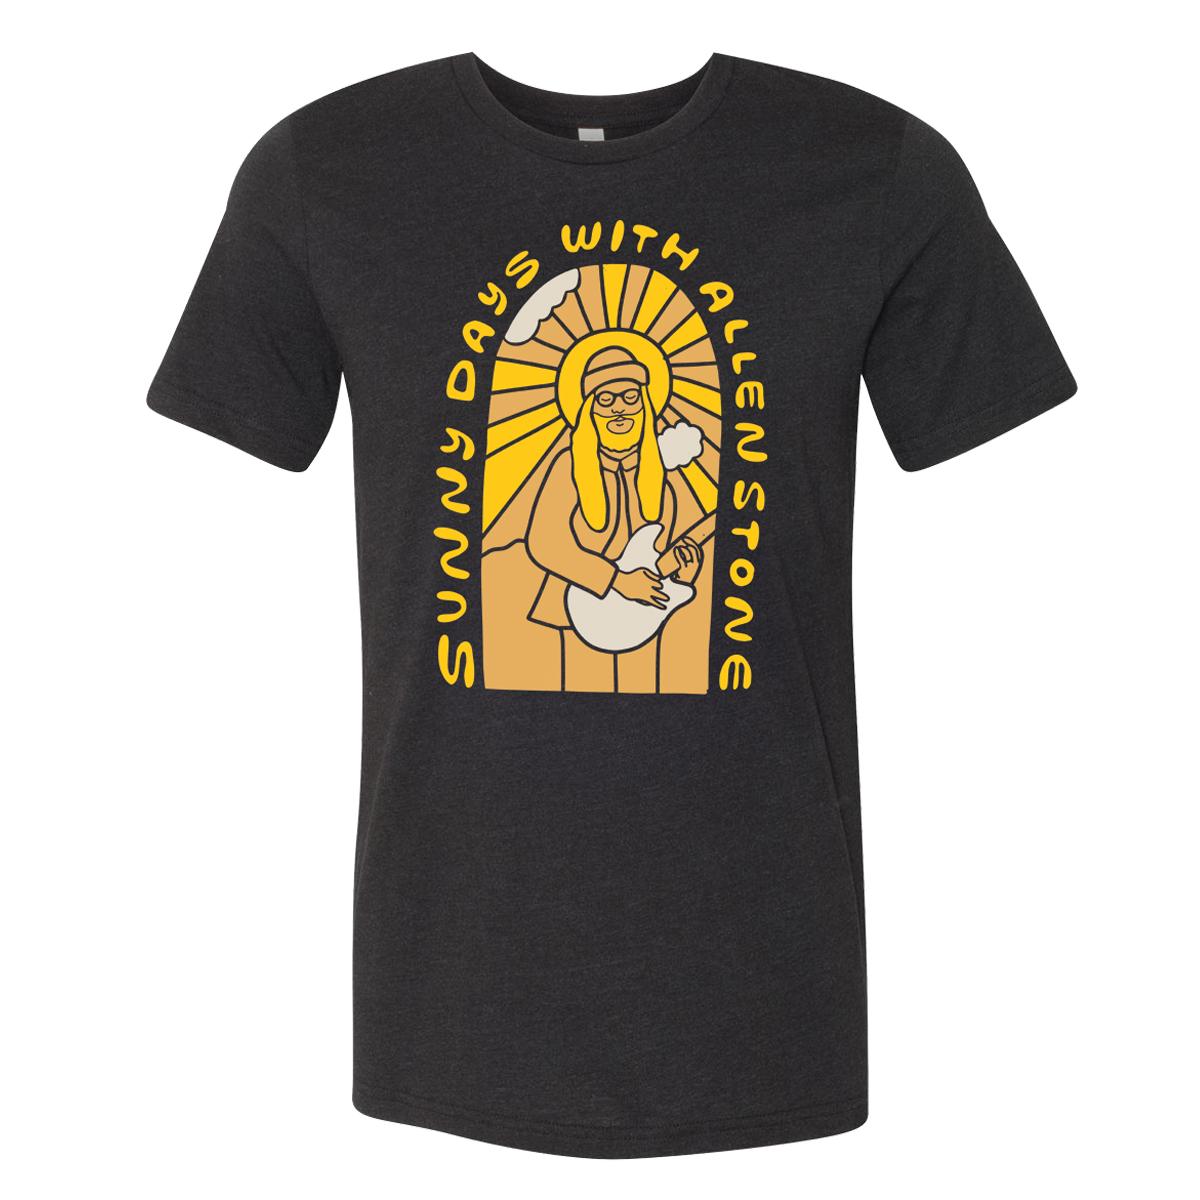 Sunny Days T-shirt (Black)